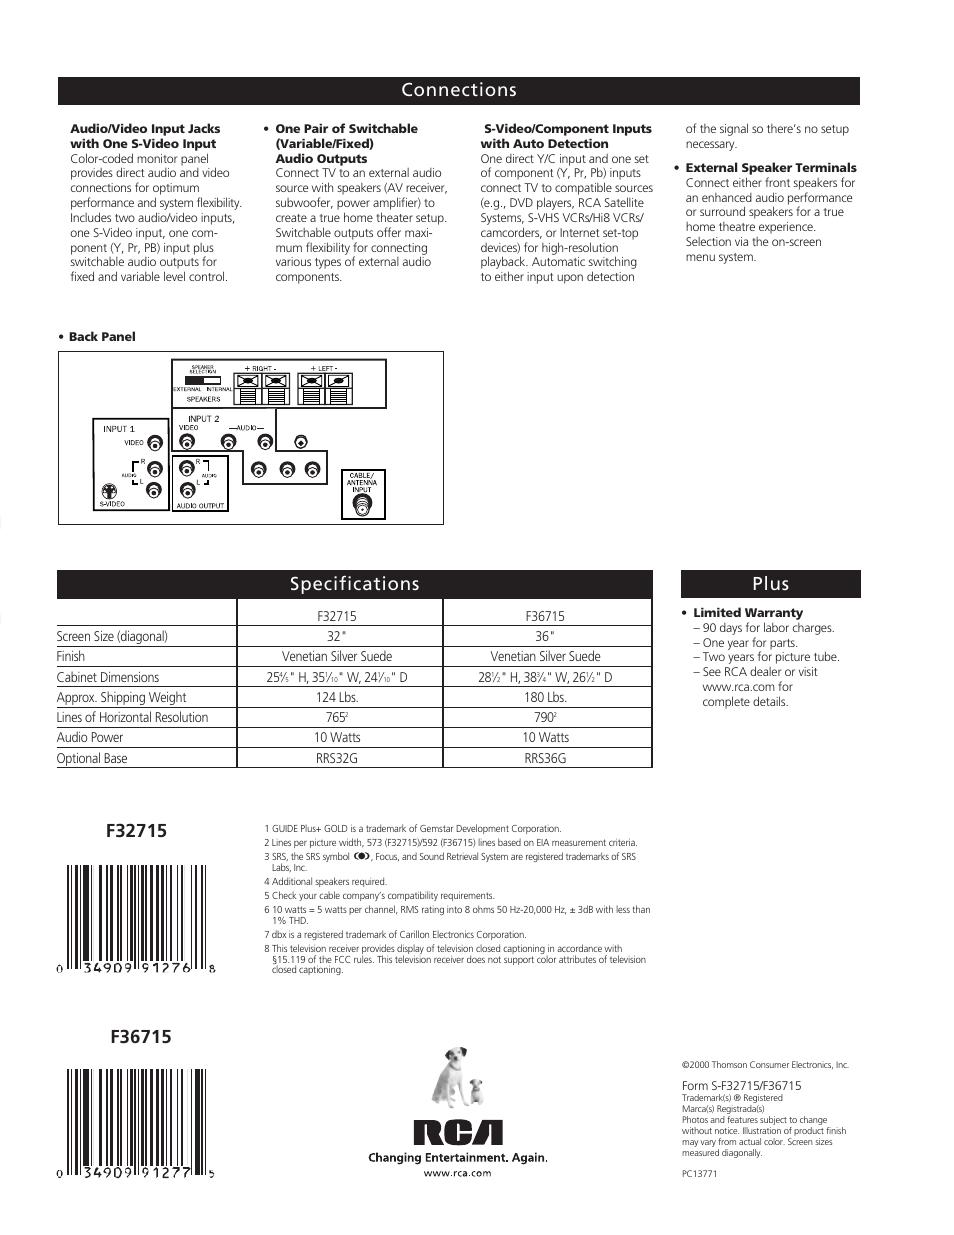 te levi s io n rca home theatre premiere f36715 user manual page rh manualsdir com RCA Home Theater System Manual RCA Home Theater Receiver Manual